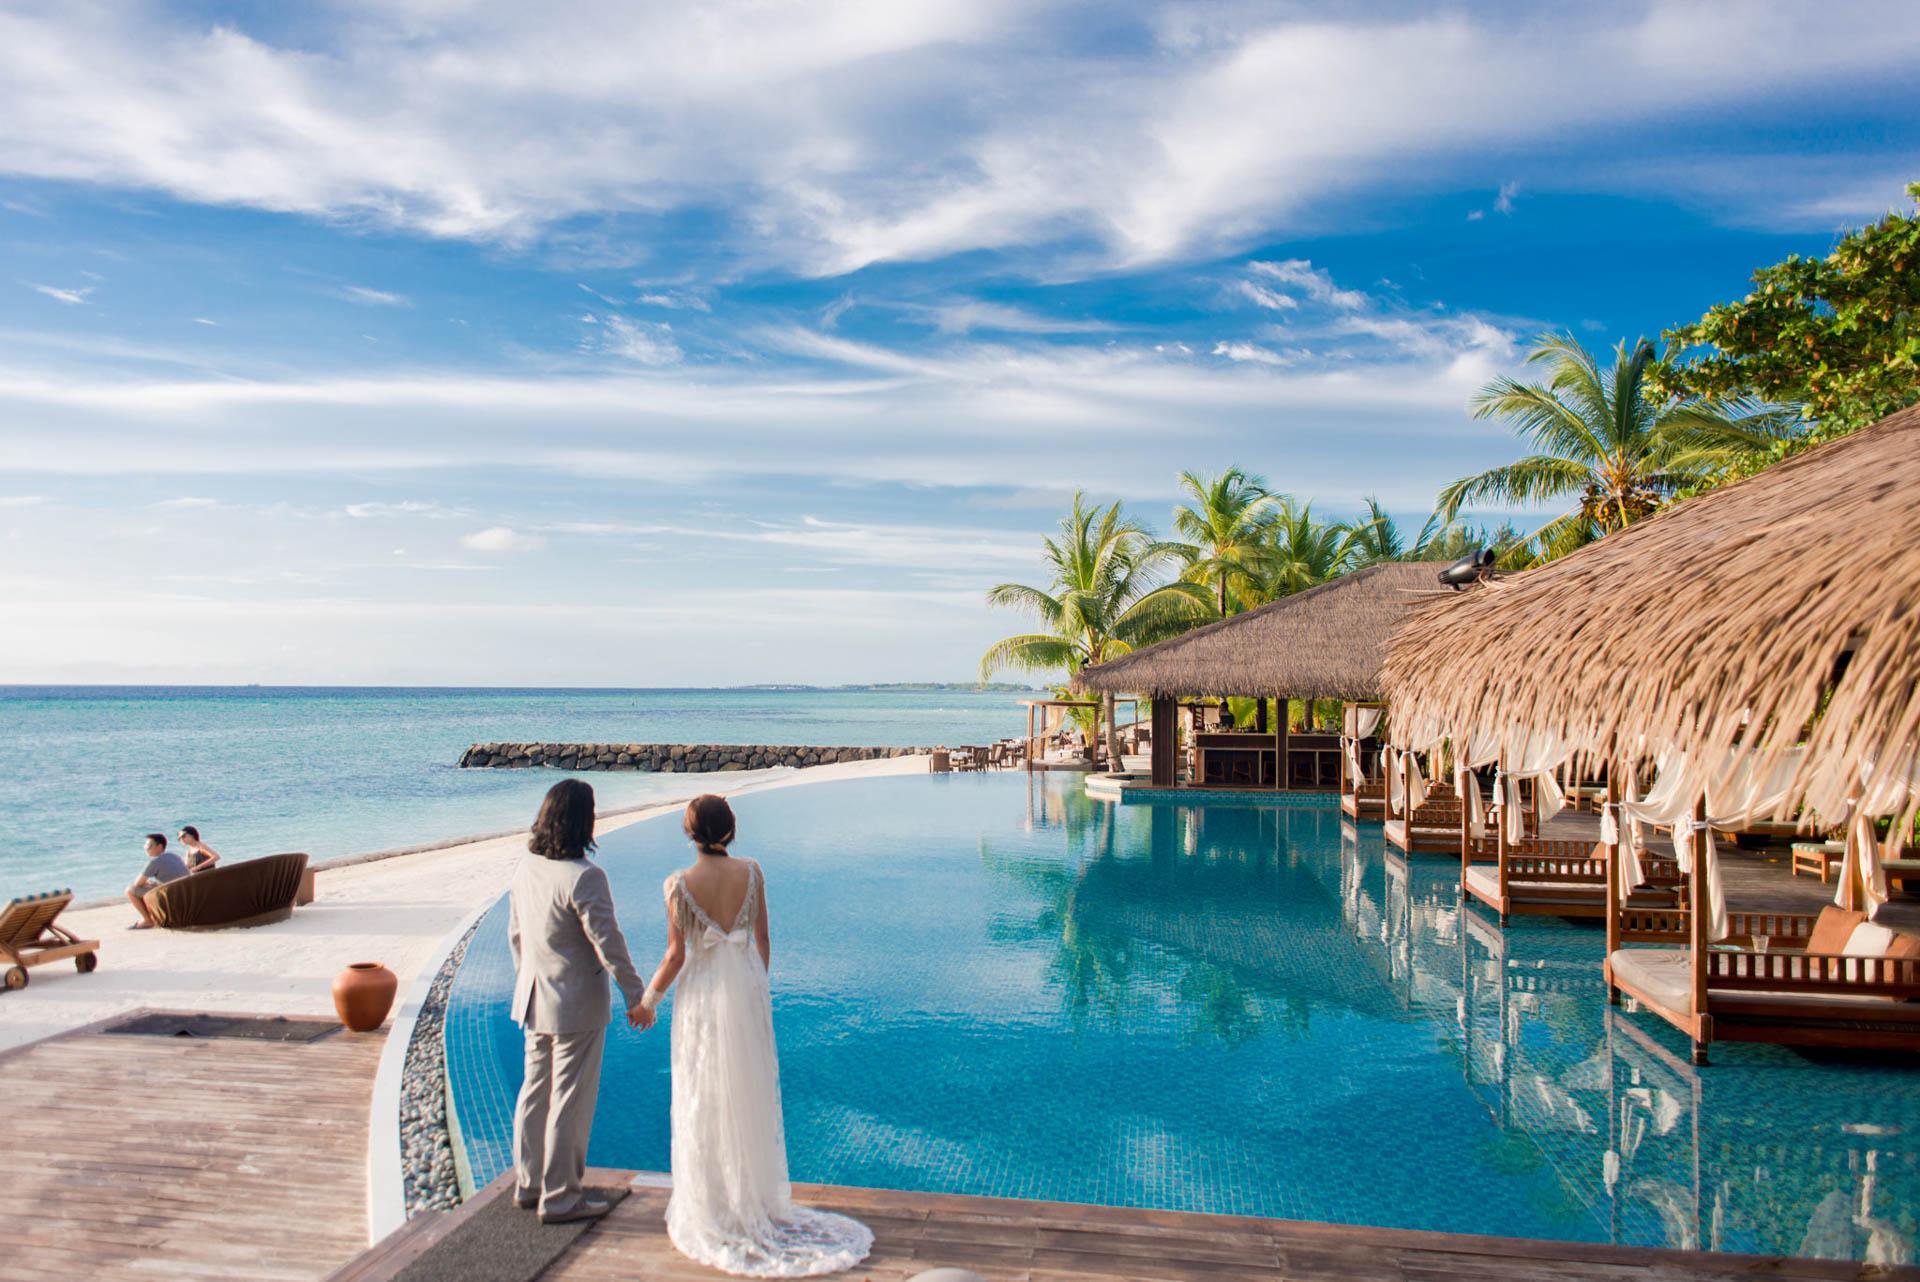 Chih Chao Yu Shan Destination Wedding at Residence Maldives 8